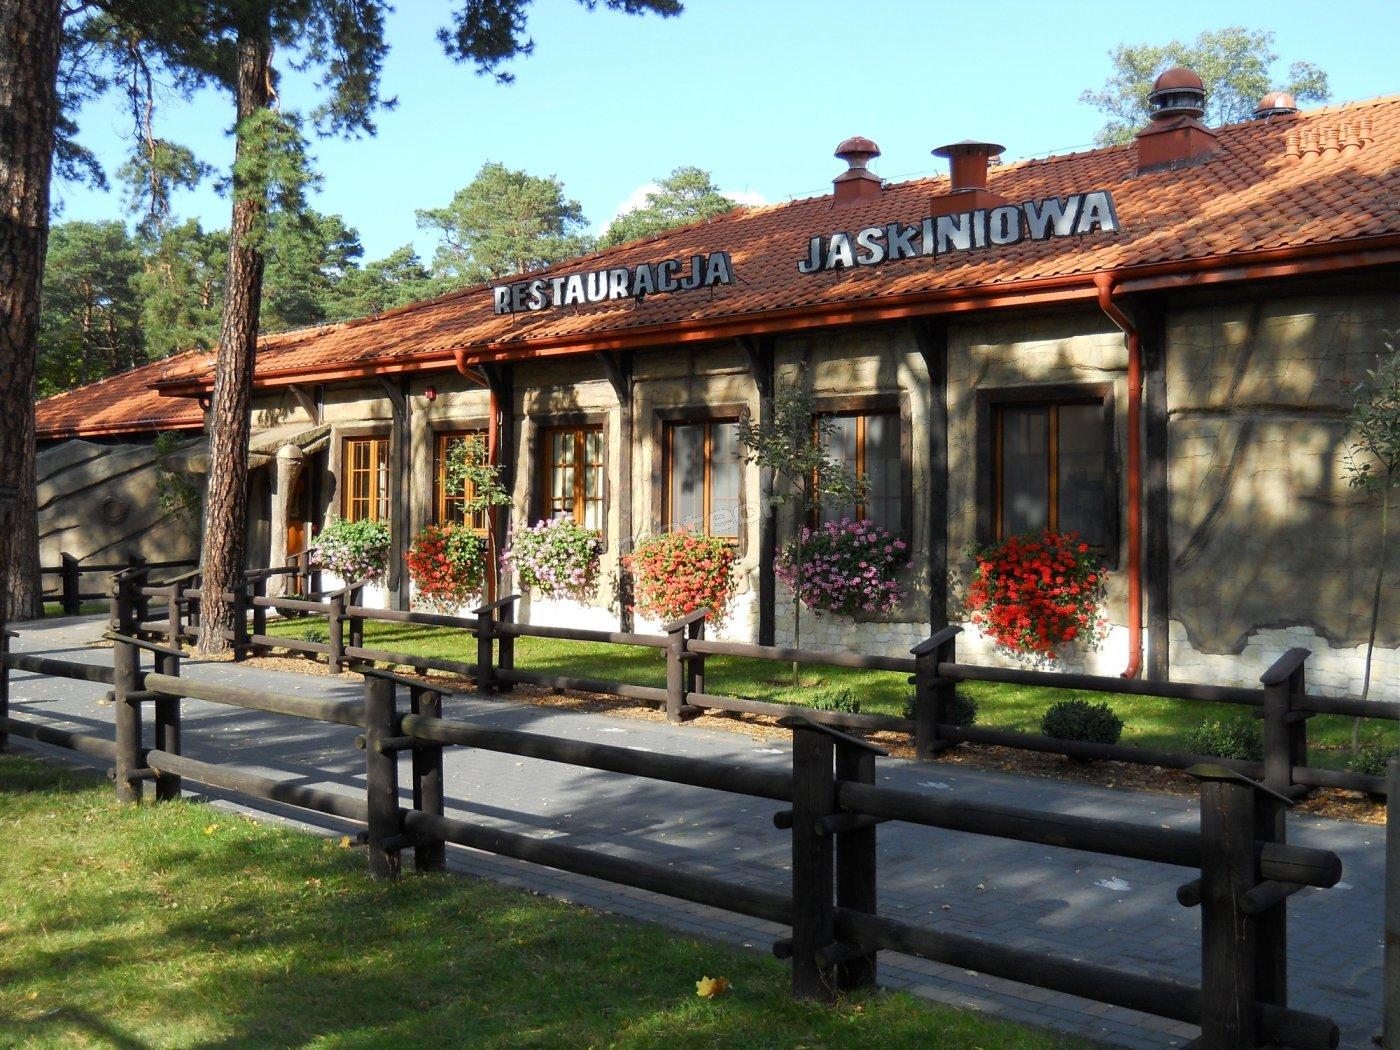 Restauracja Jaskiniowa